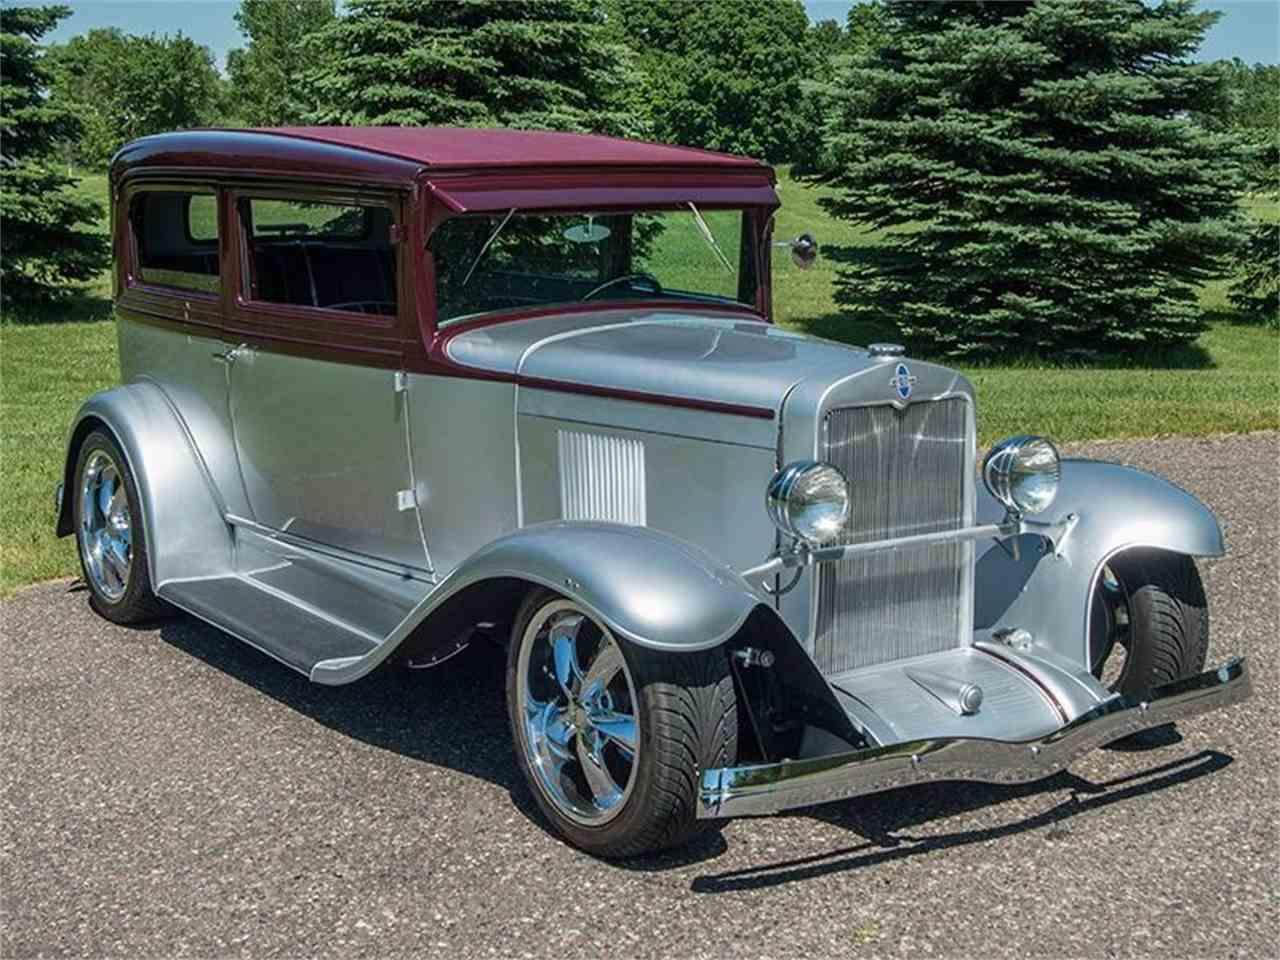 1930 Chevrolet Street Rod for Sale | ClassicCars.com | CC-1028431